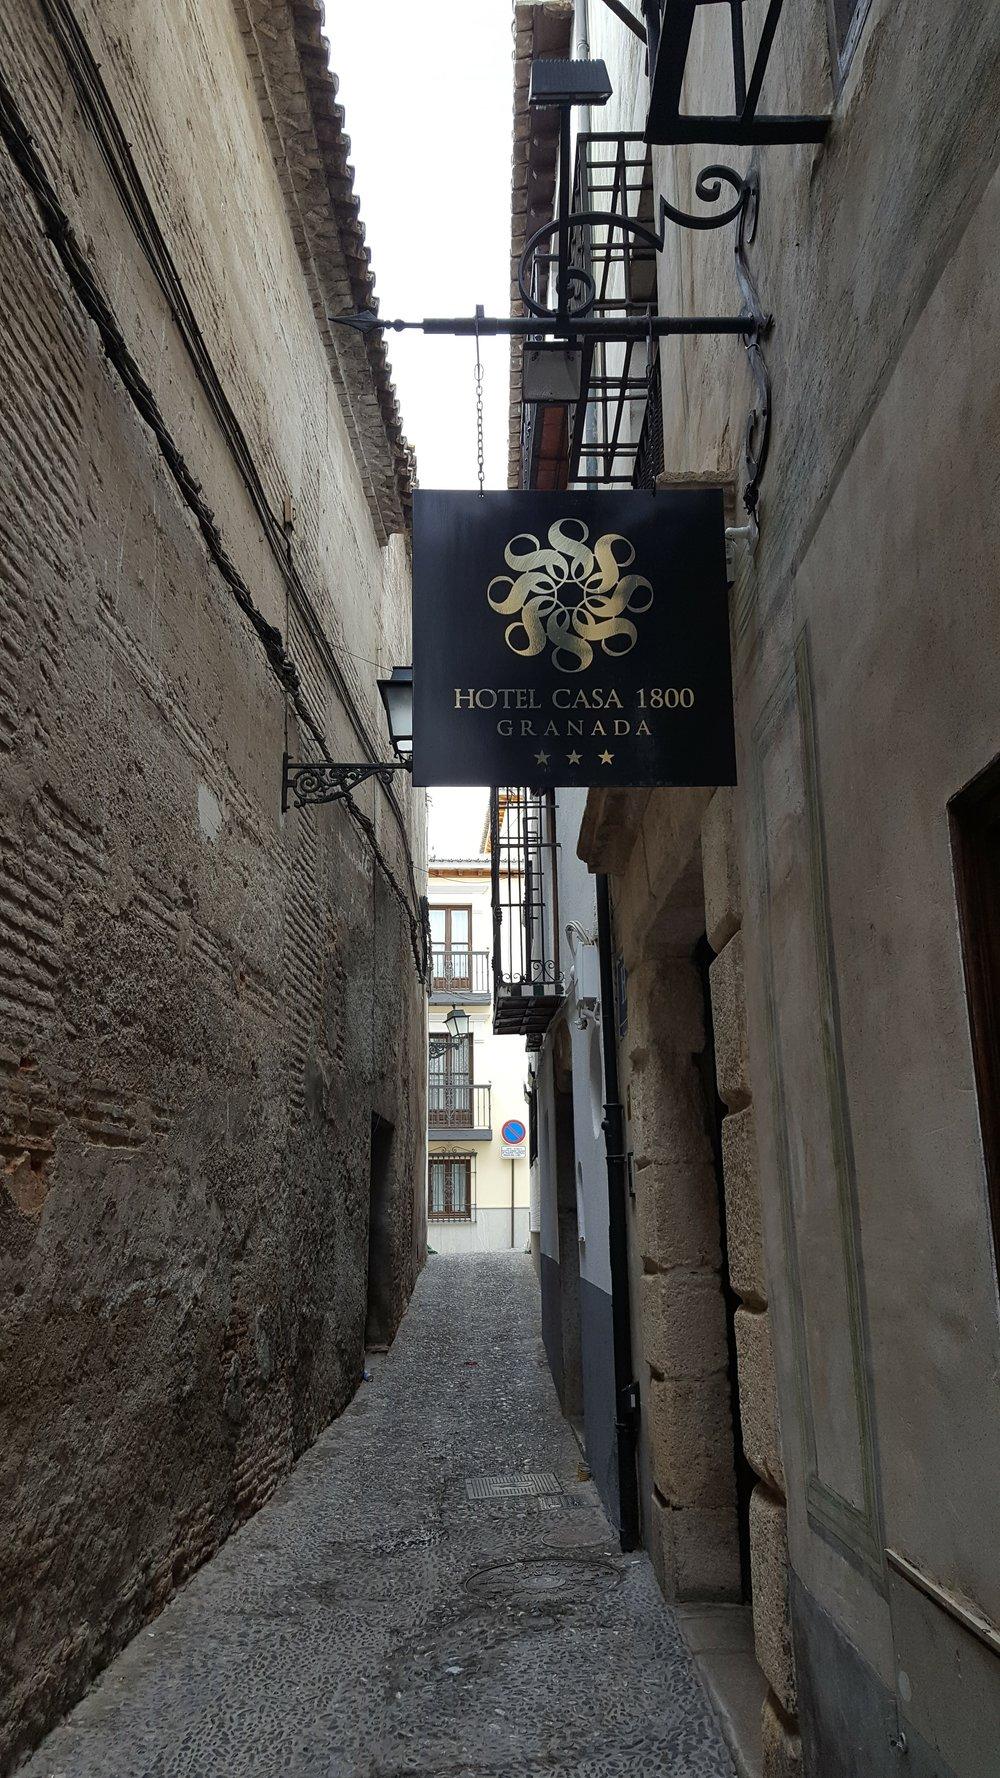 Hotel Casa 1800 in Granada